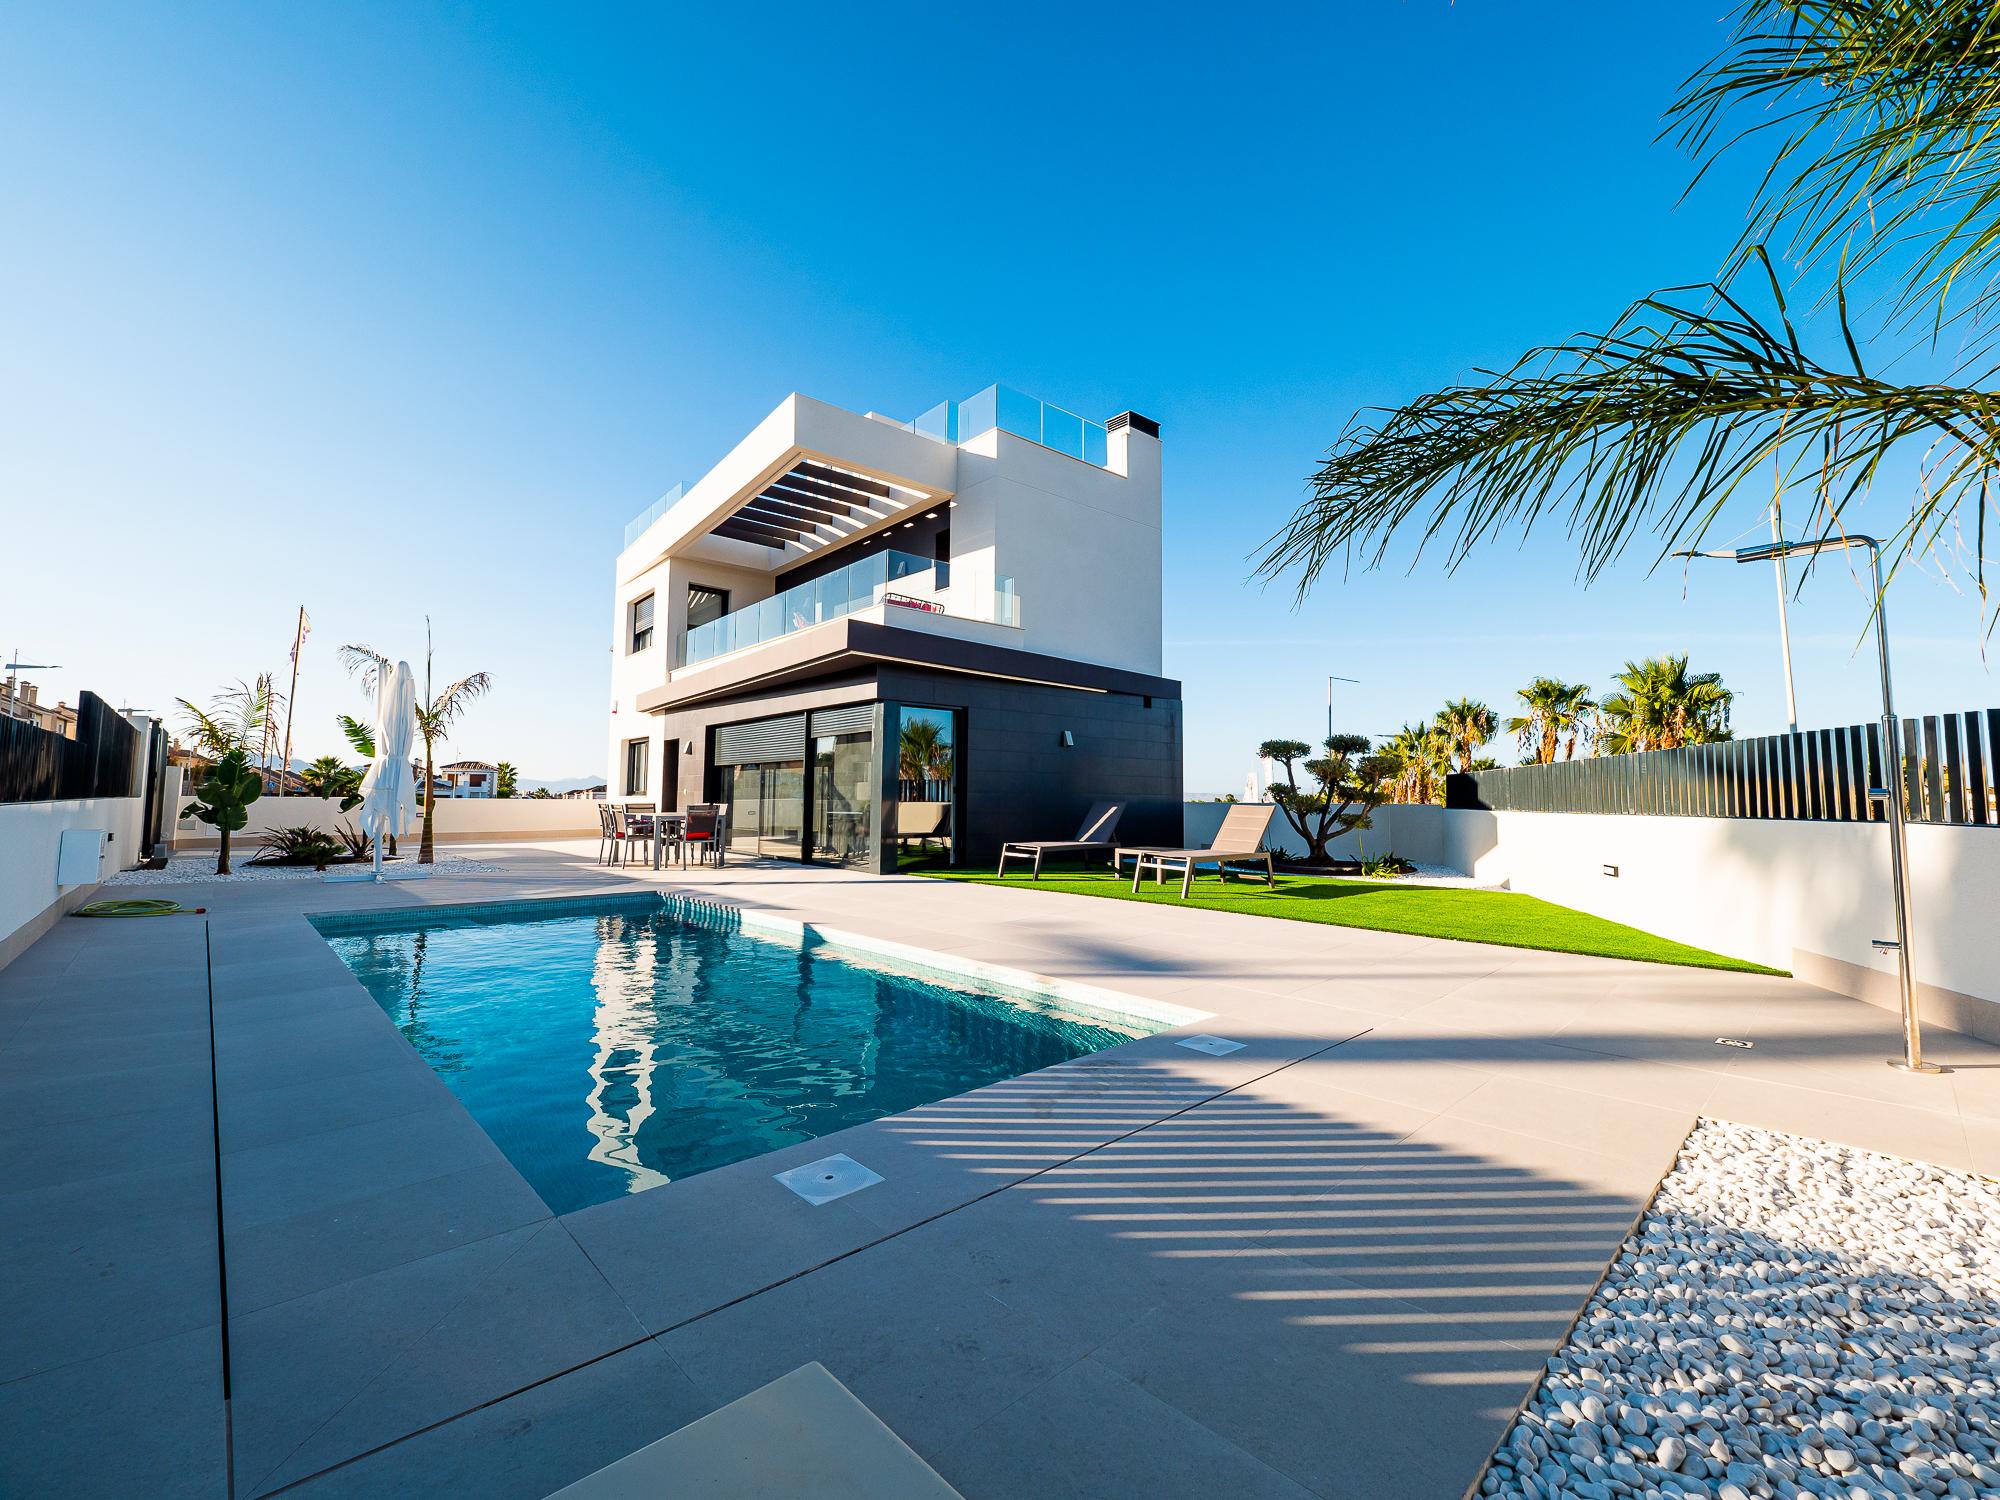 New build 3 bedroom villas with private pool on the popular La Finca Golf Resort